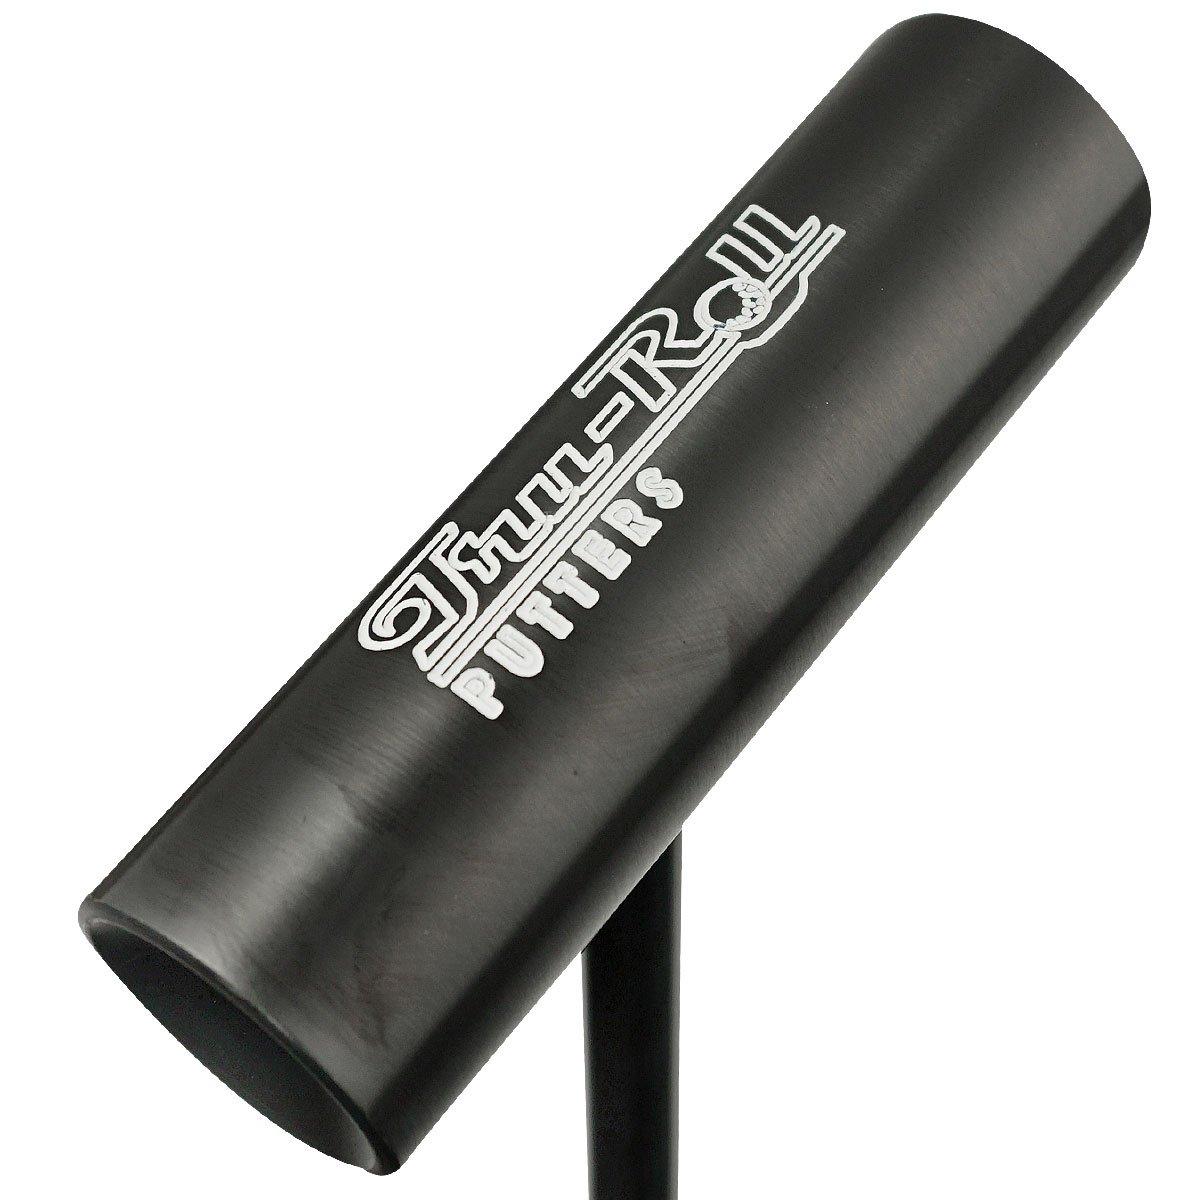 Tru-Roll ゴルフ センターシャフト TR-III オールブラック パター ブラックスチールシャフト 35インチ